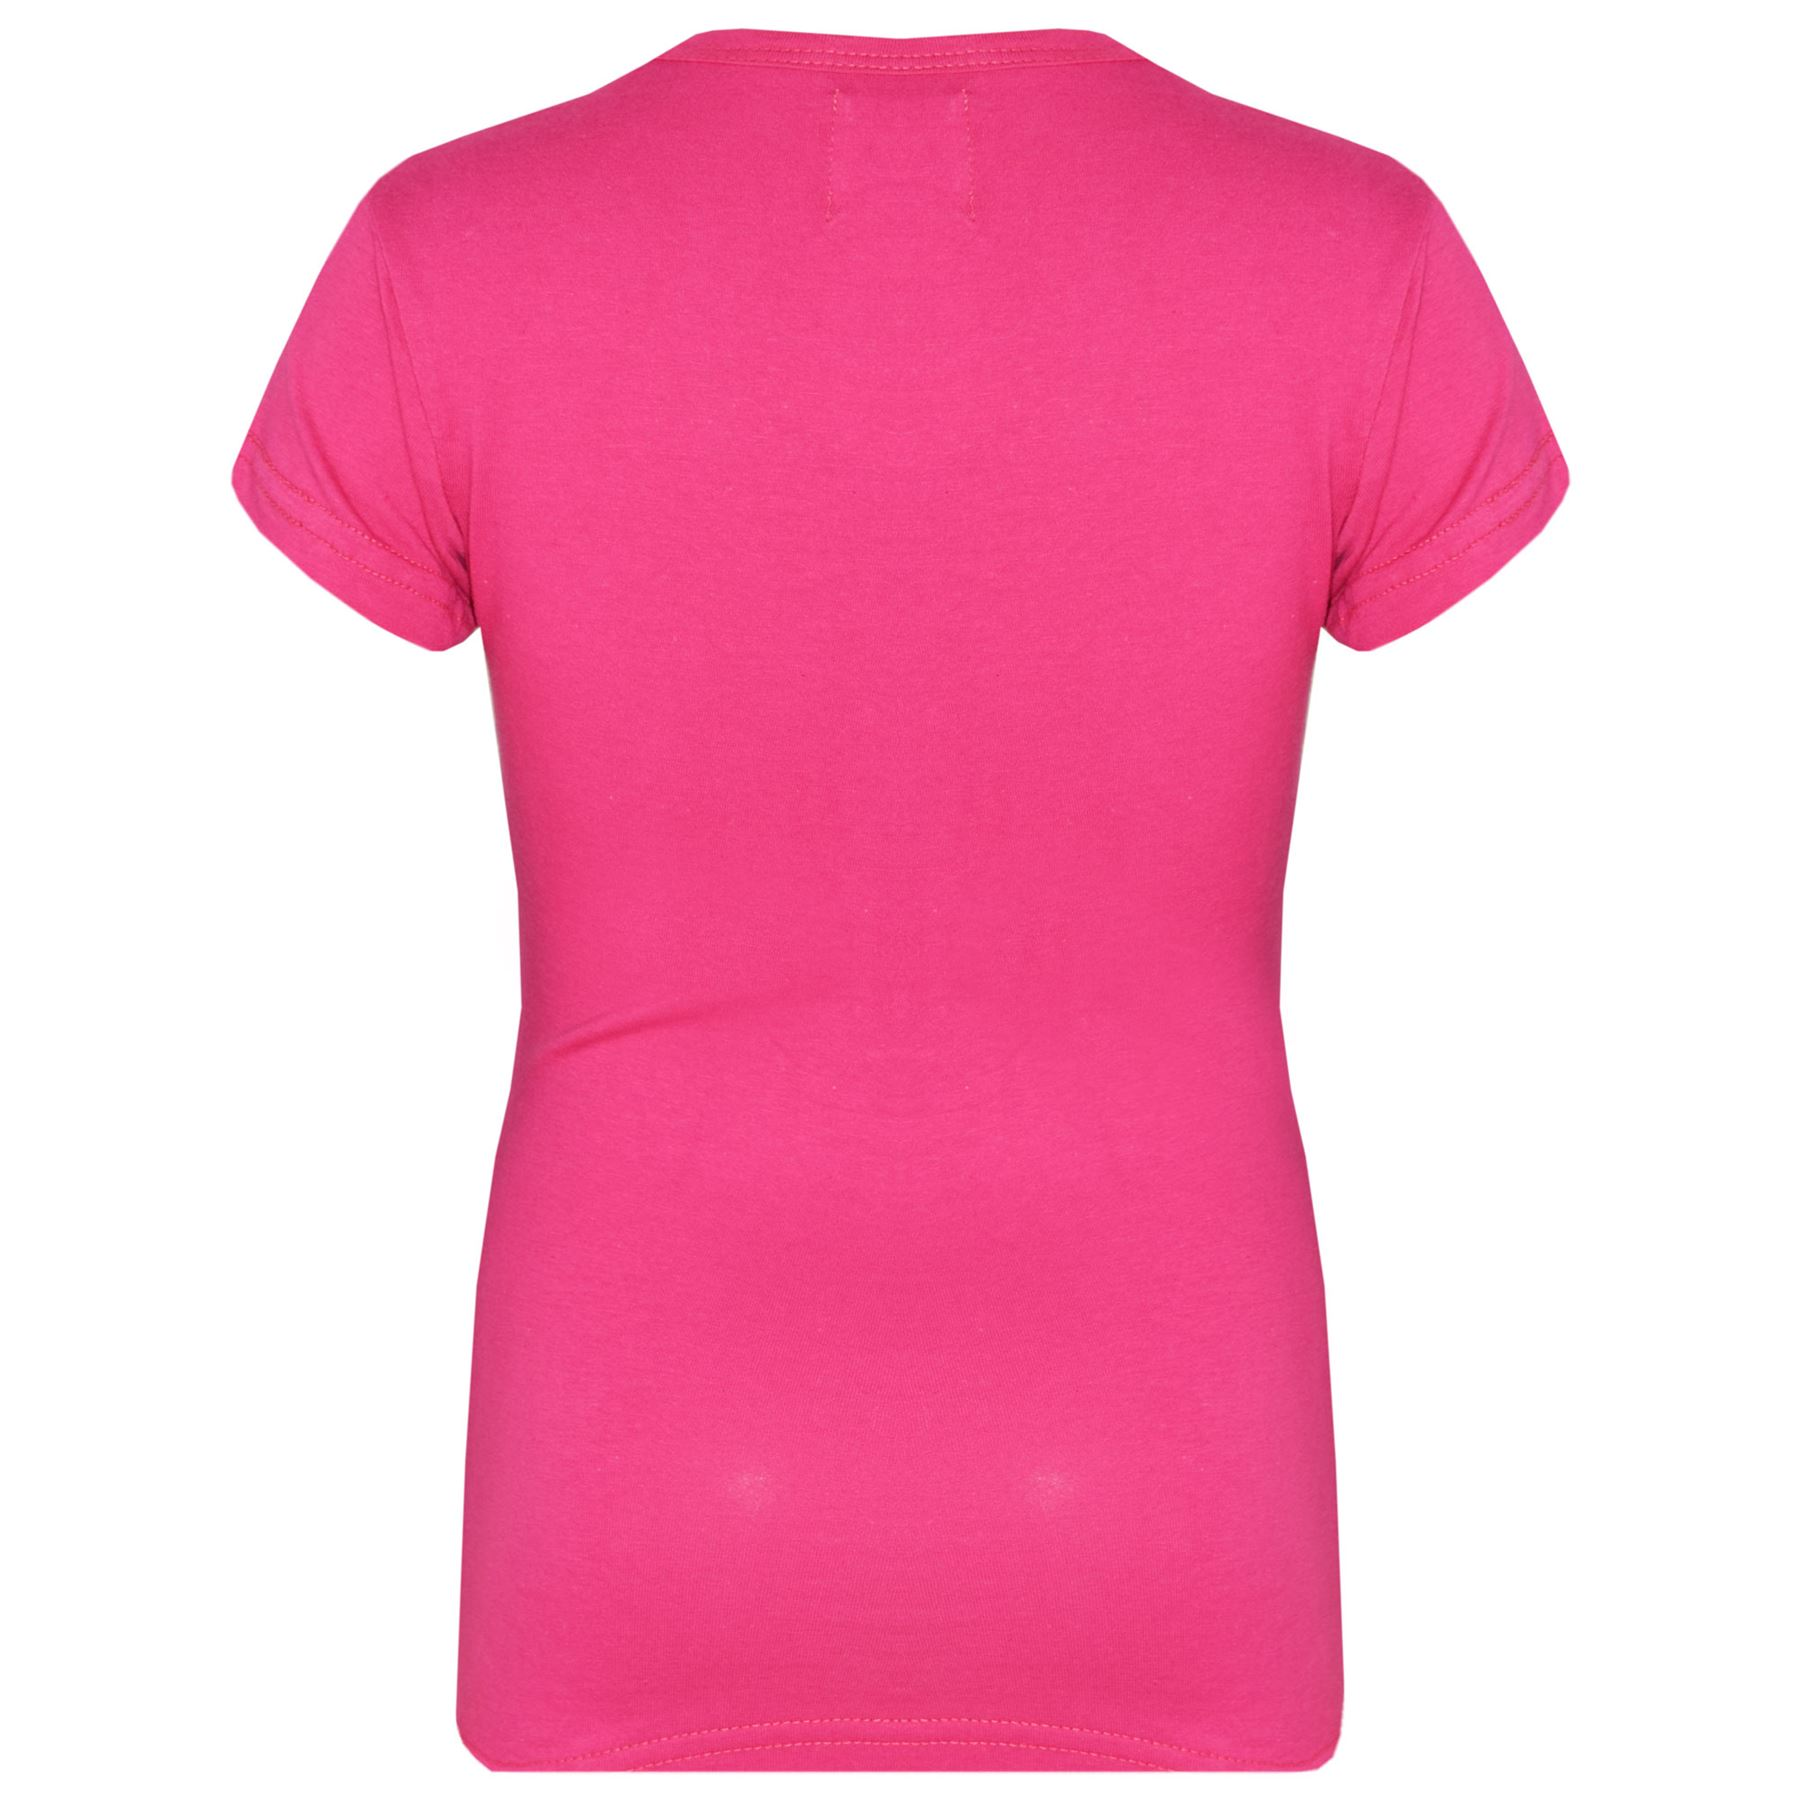 Kids-Girls-T-Shirts-Designer-100-Cotton-Plain-School-T-Shirt-Top-New-Age-3-13Yr thumbnail 30